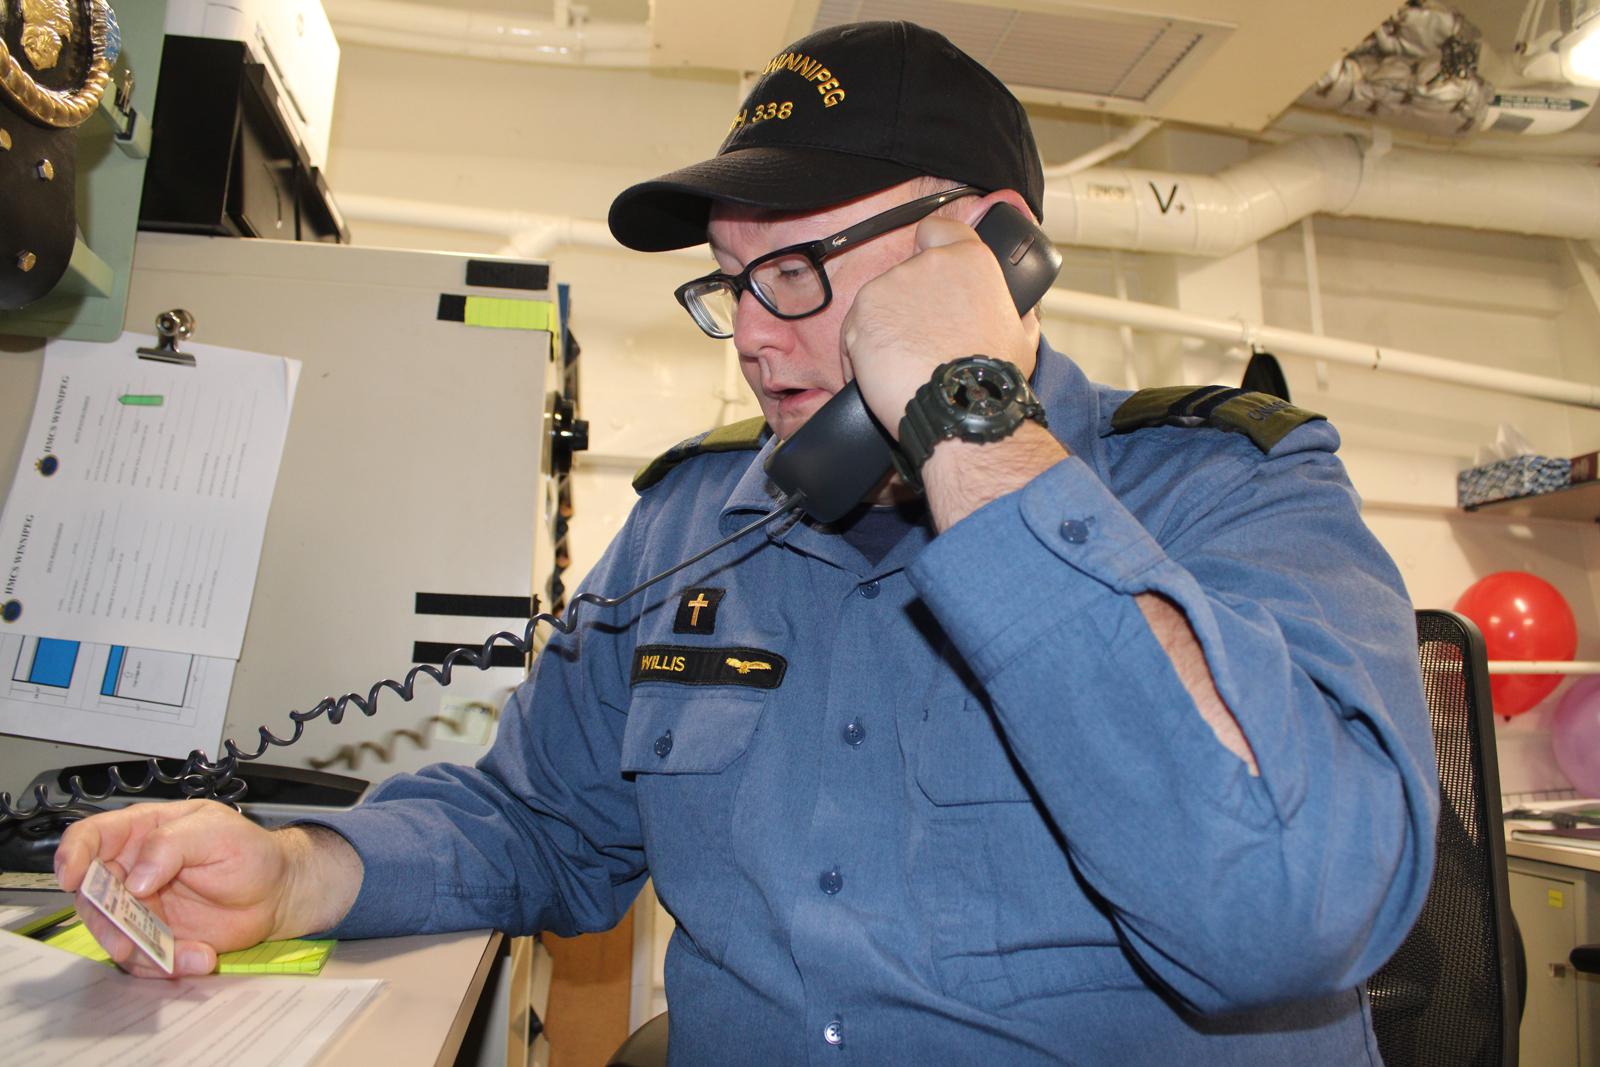 Capt Chris Willis, HMCS Winnipeg's Padre, casts his vote in the provincial election via phone.